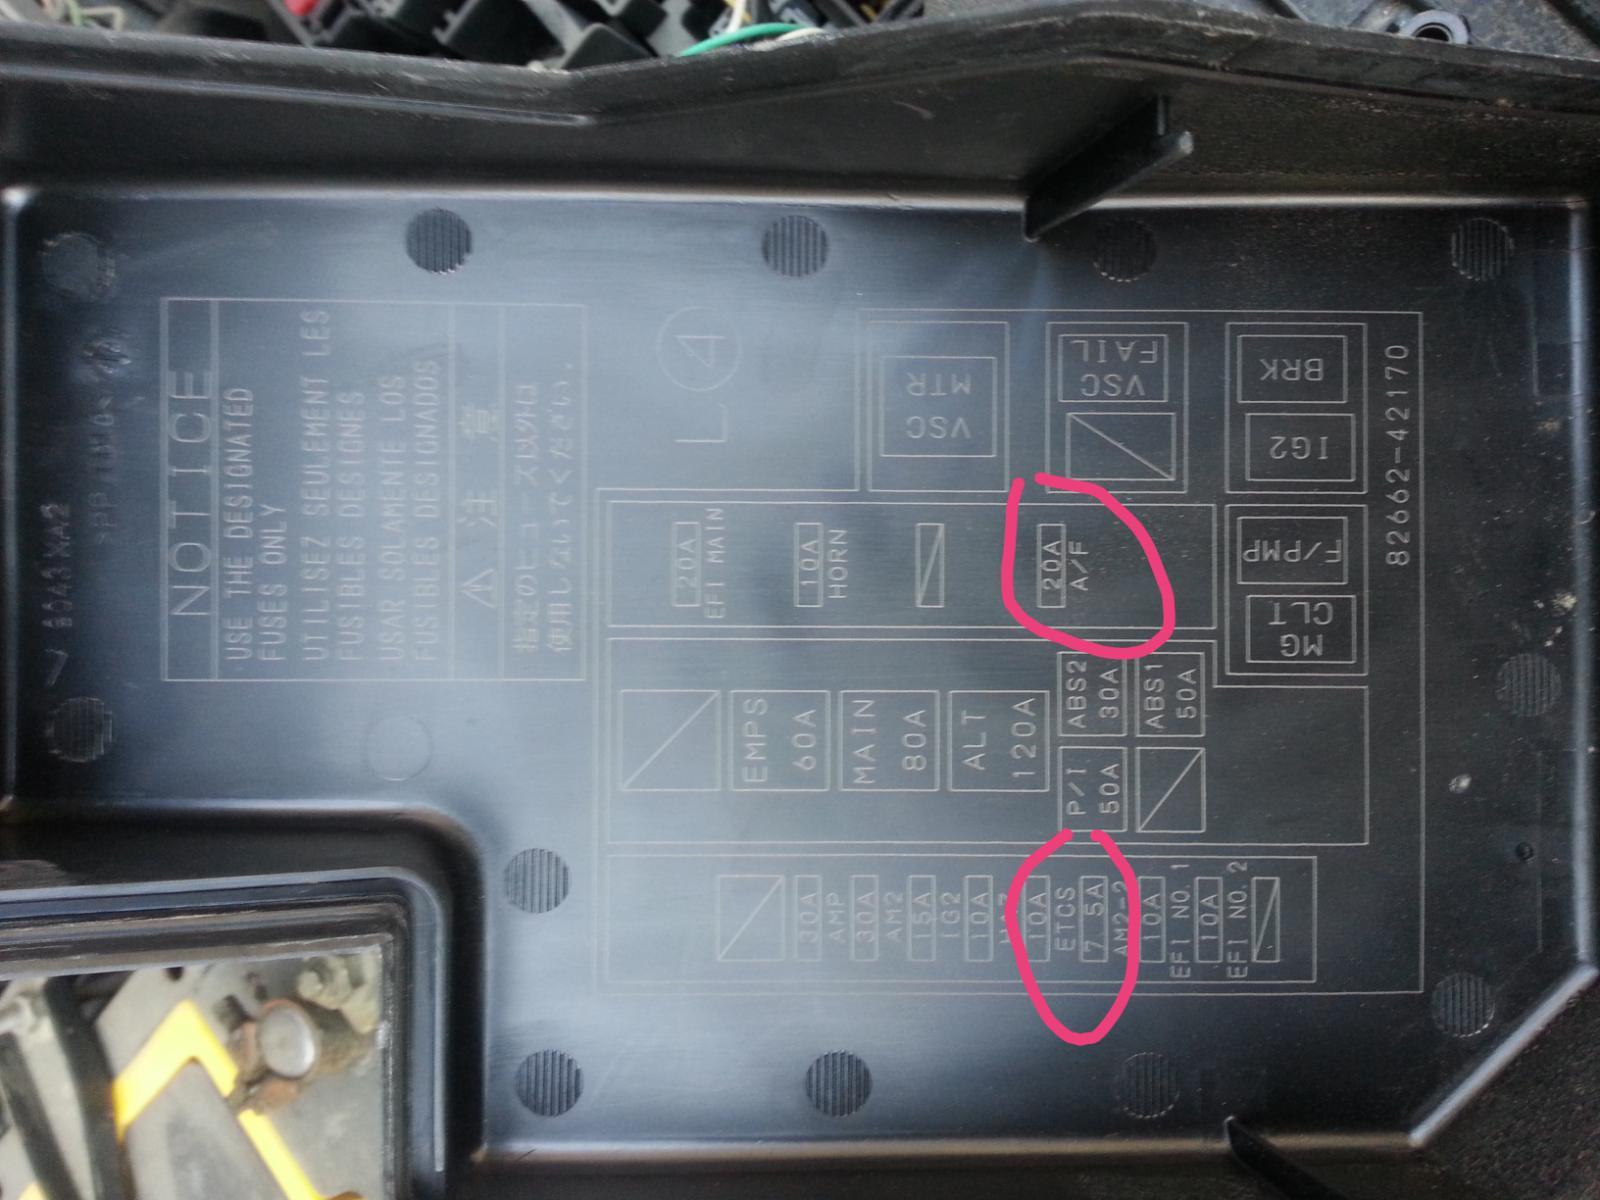 jumper method codes help   Toyota RAV4 Forums